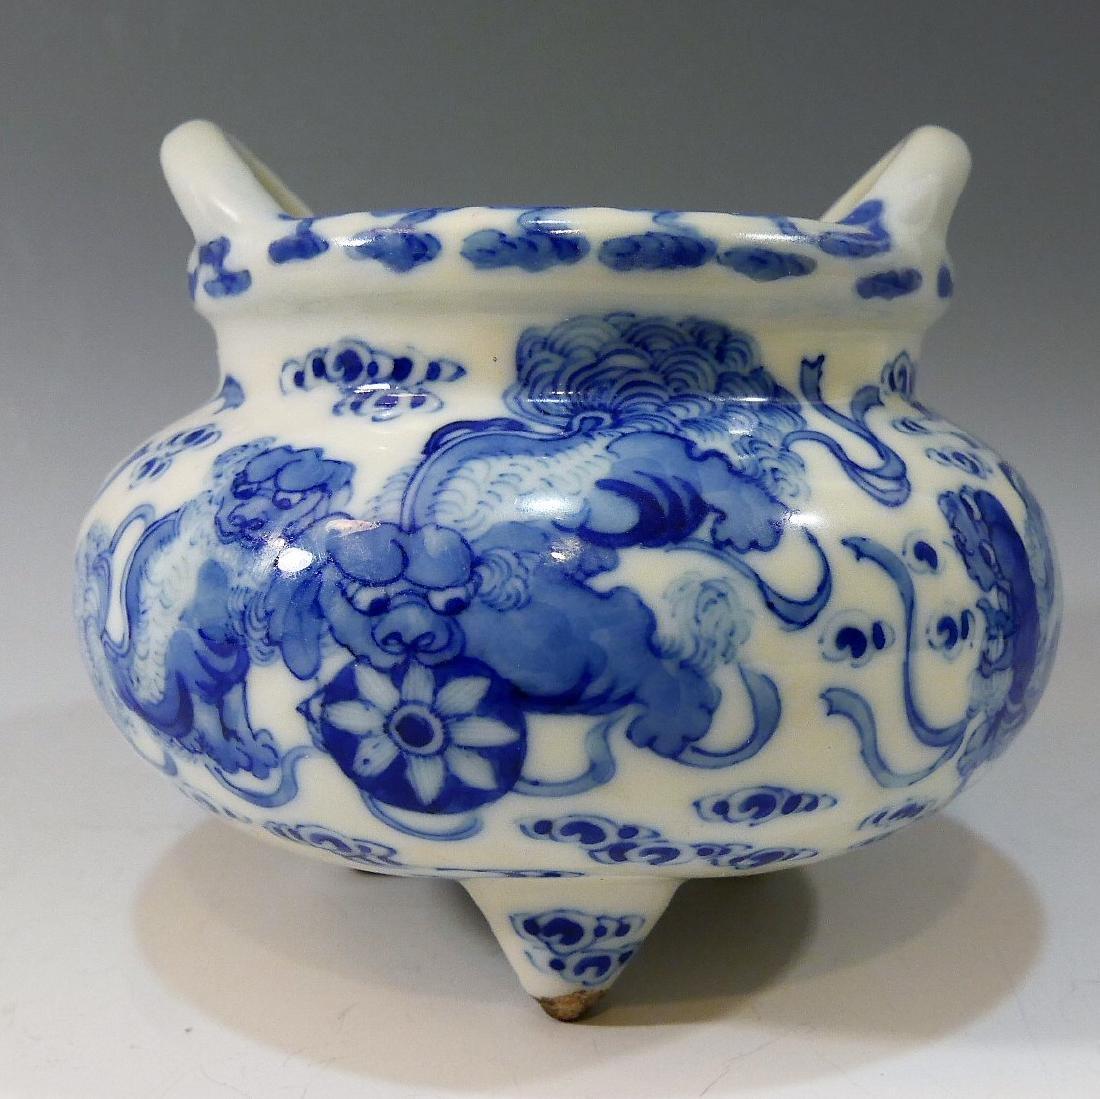 CHINESE ANTIQUE BLUE WHITE TRIPOD CENSER - YONGZHENG